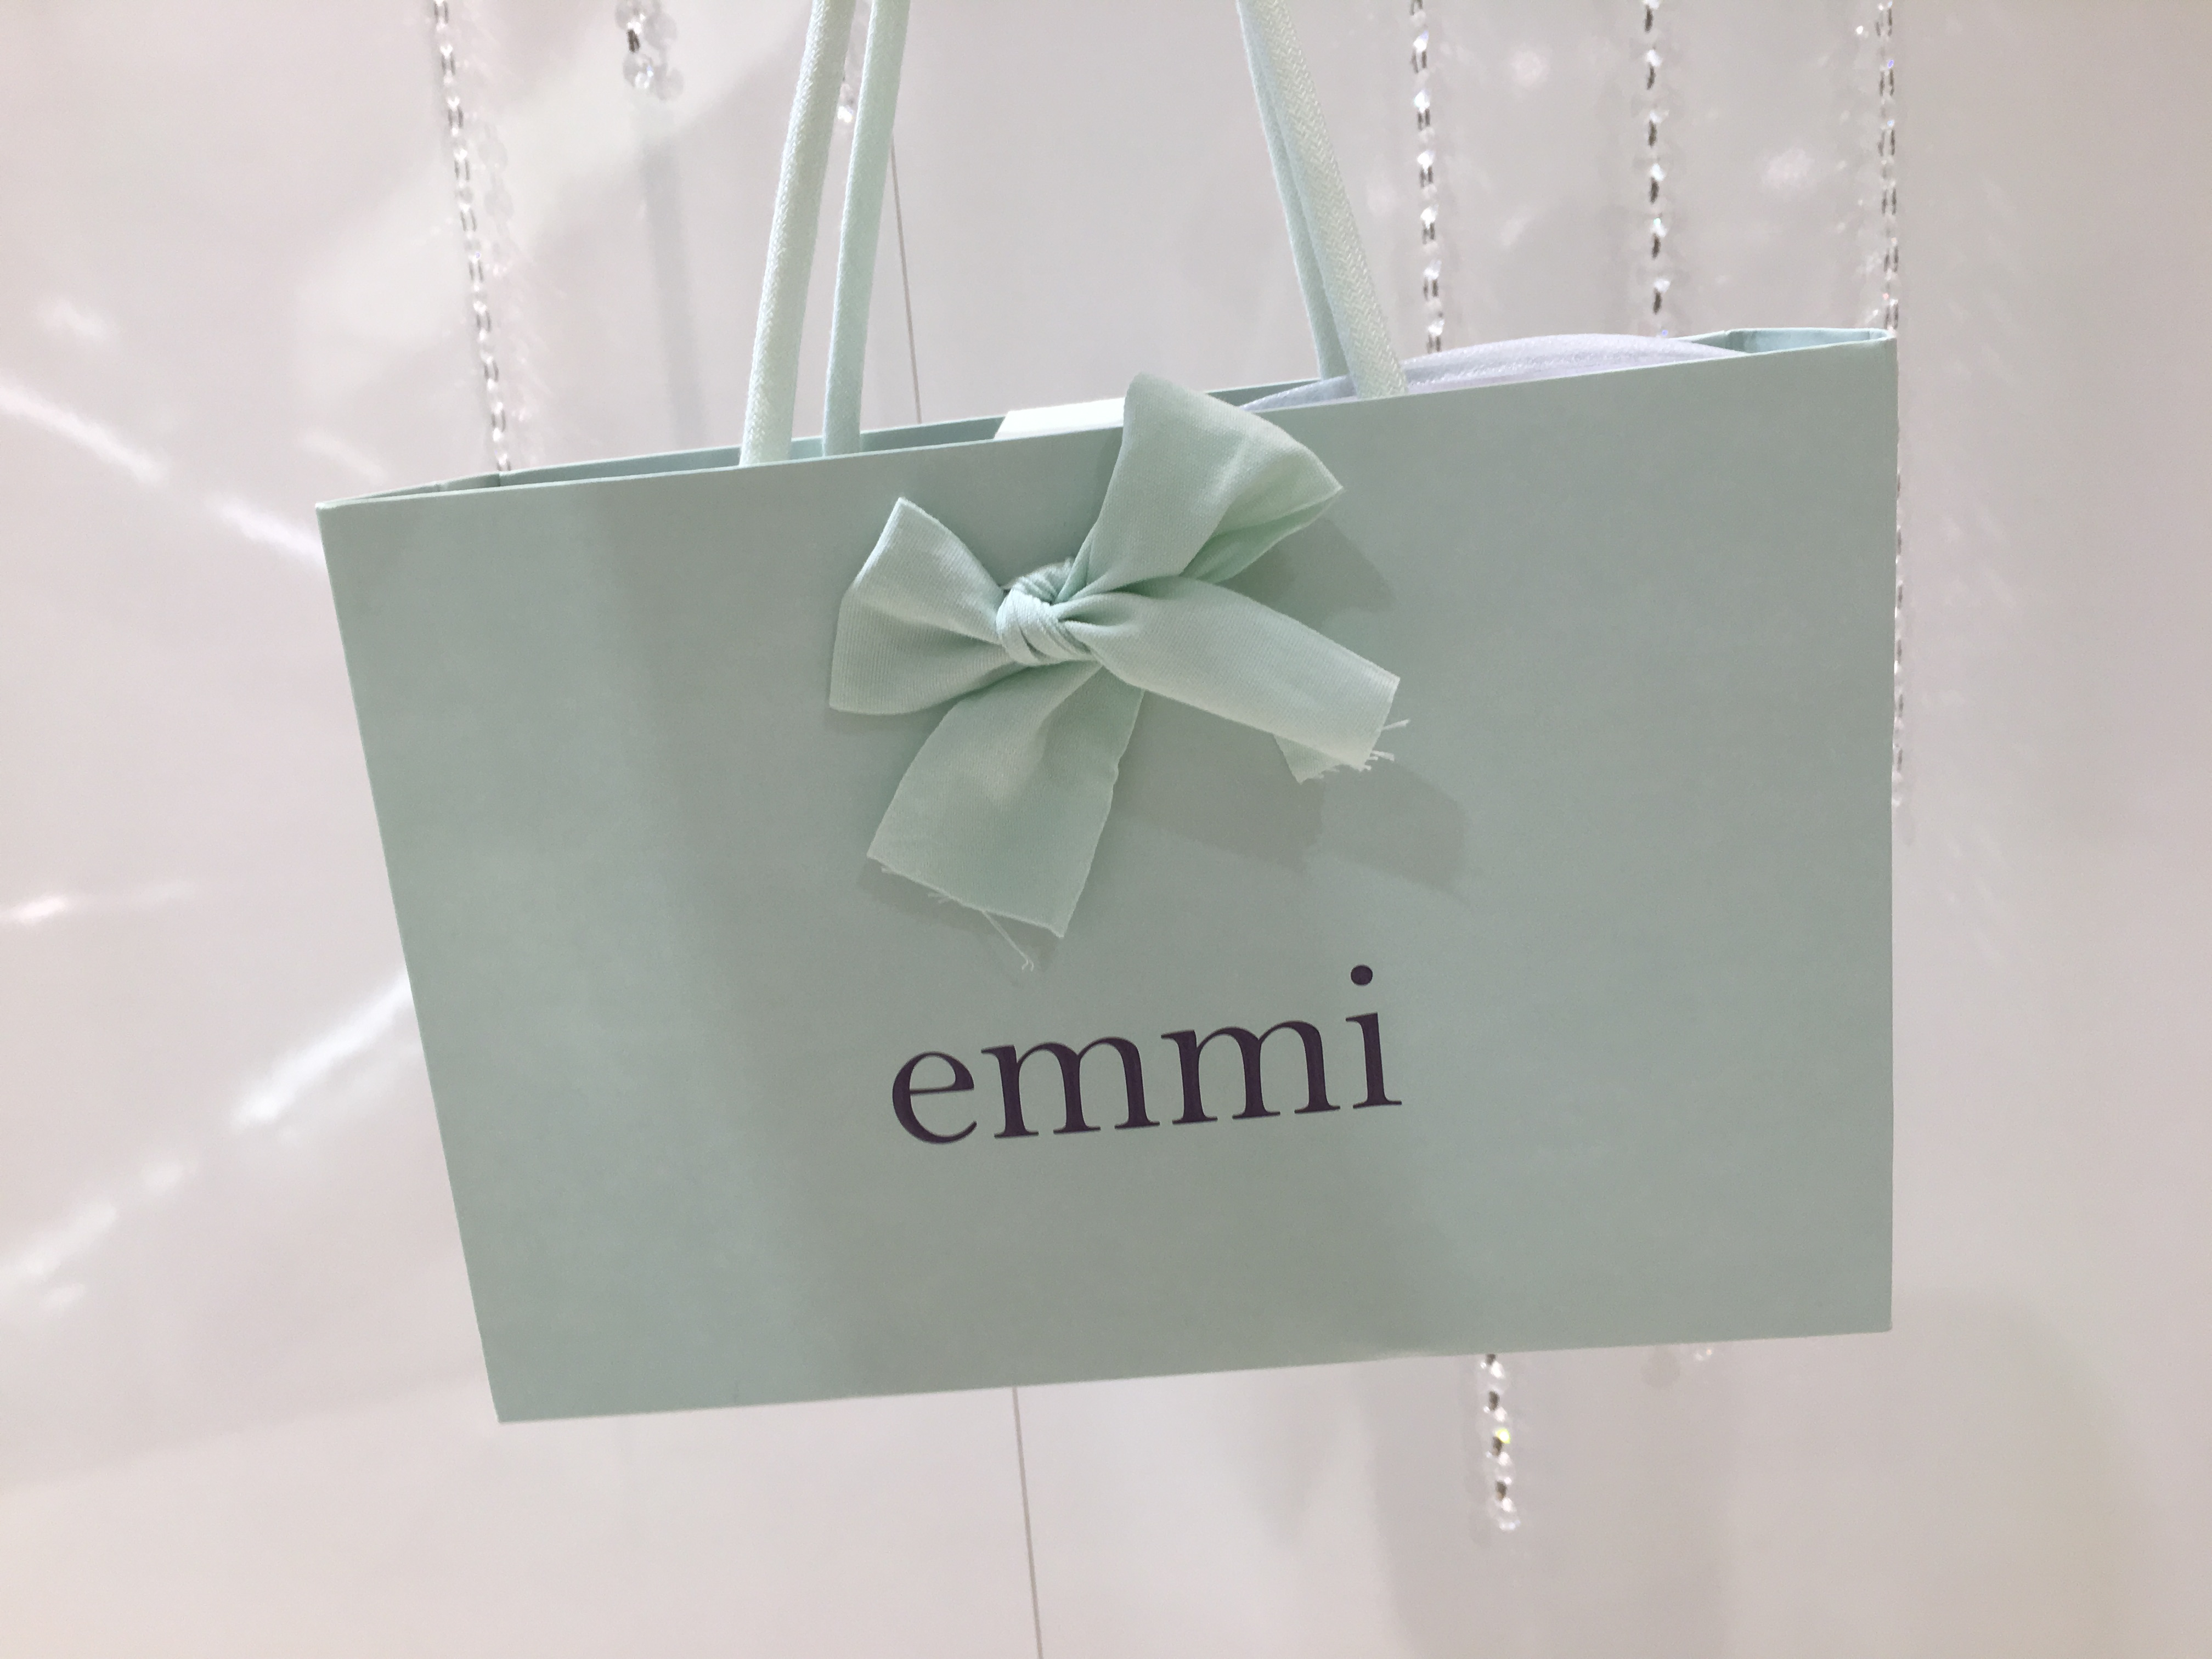 【emmi】ニューバランスの特注カラーがかわいい!_1